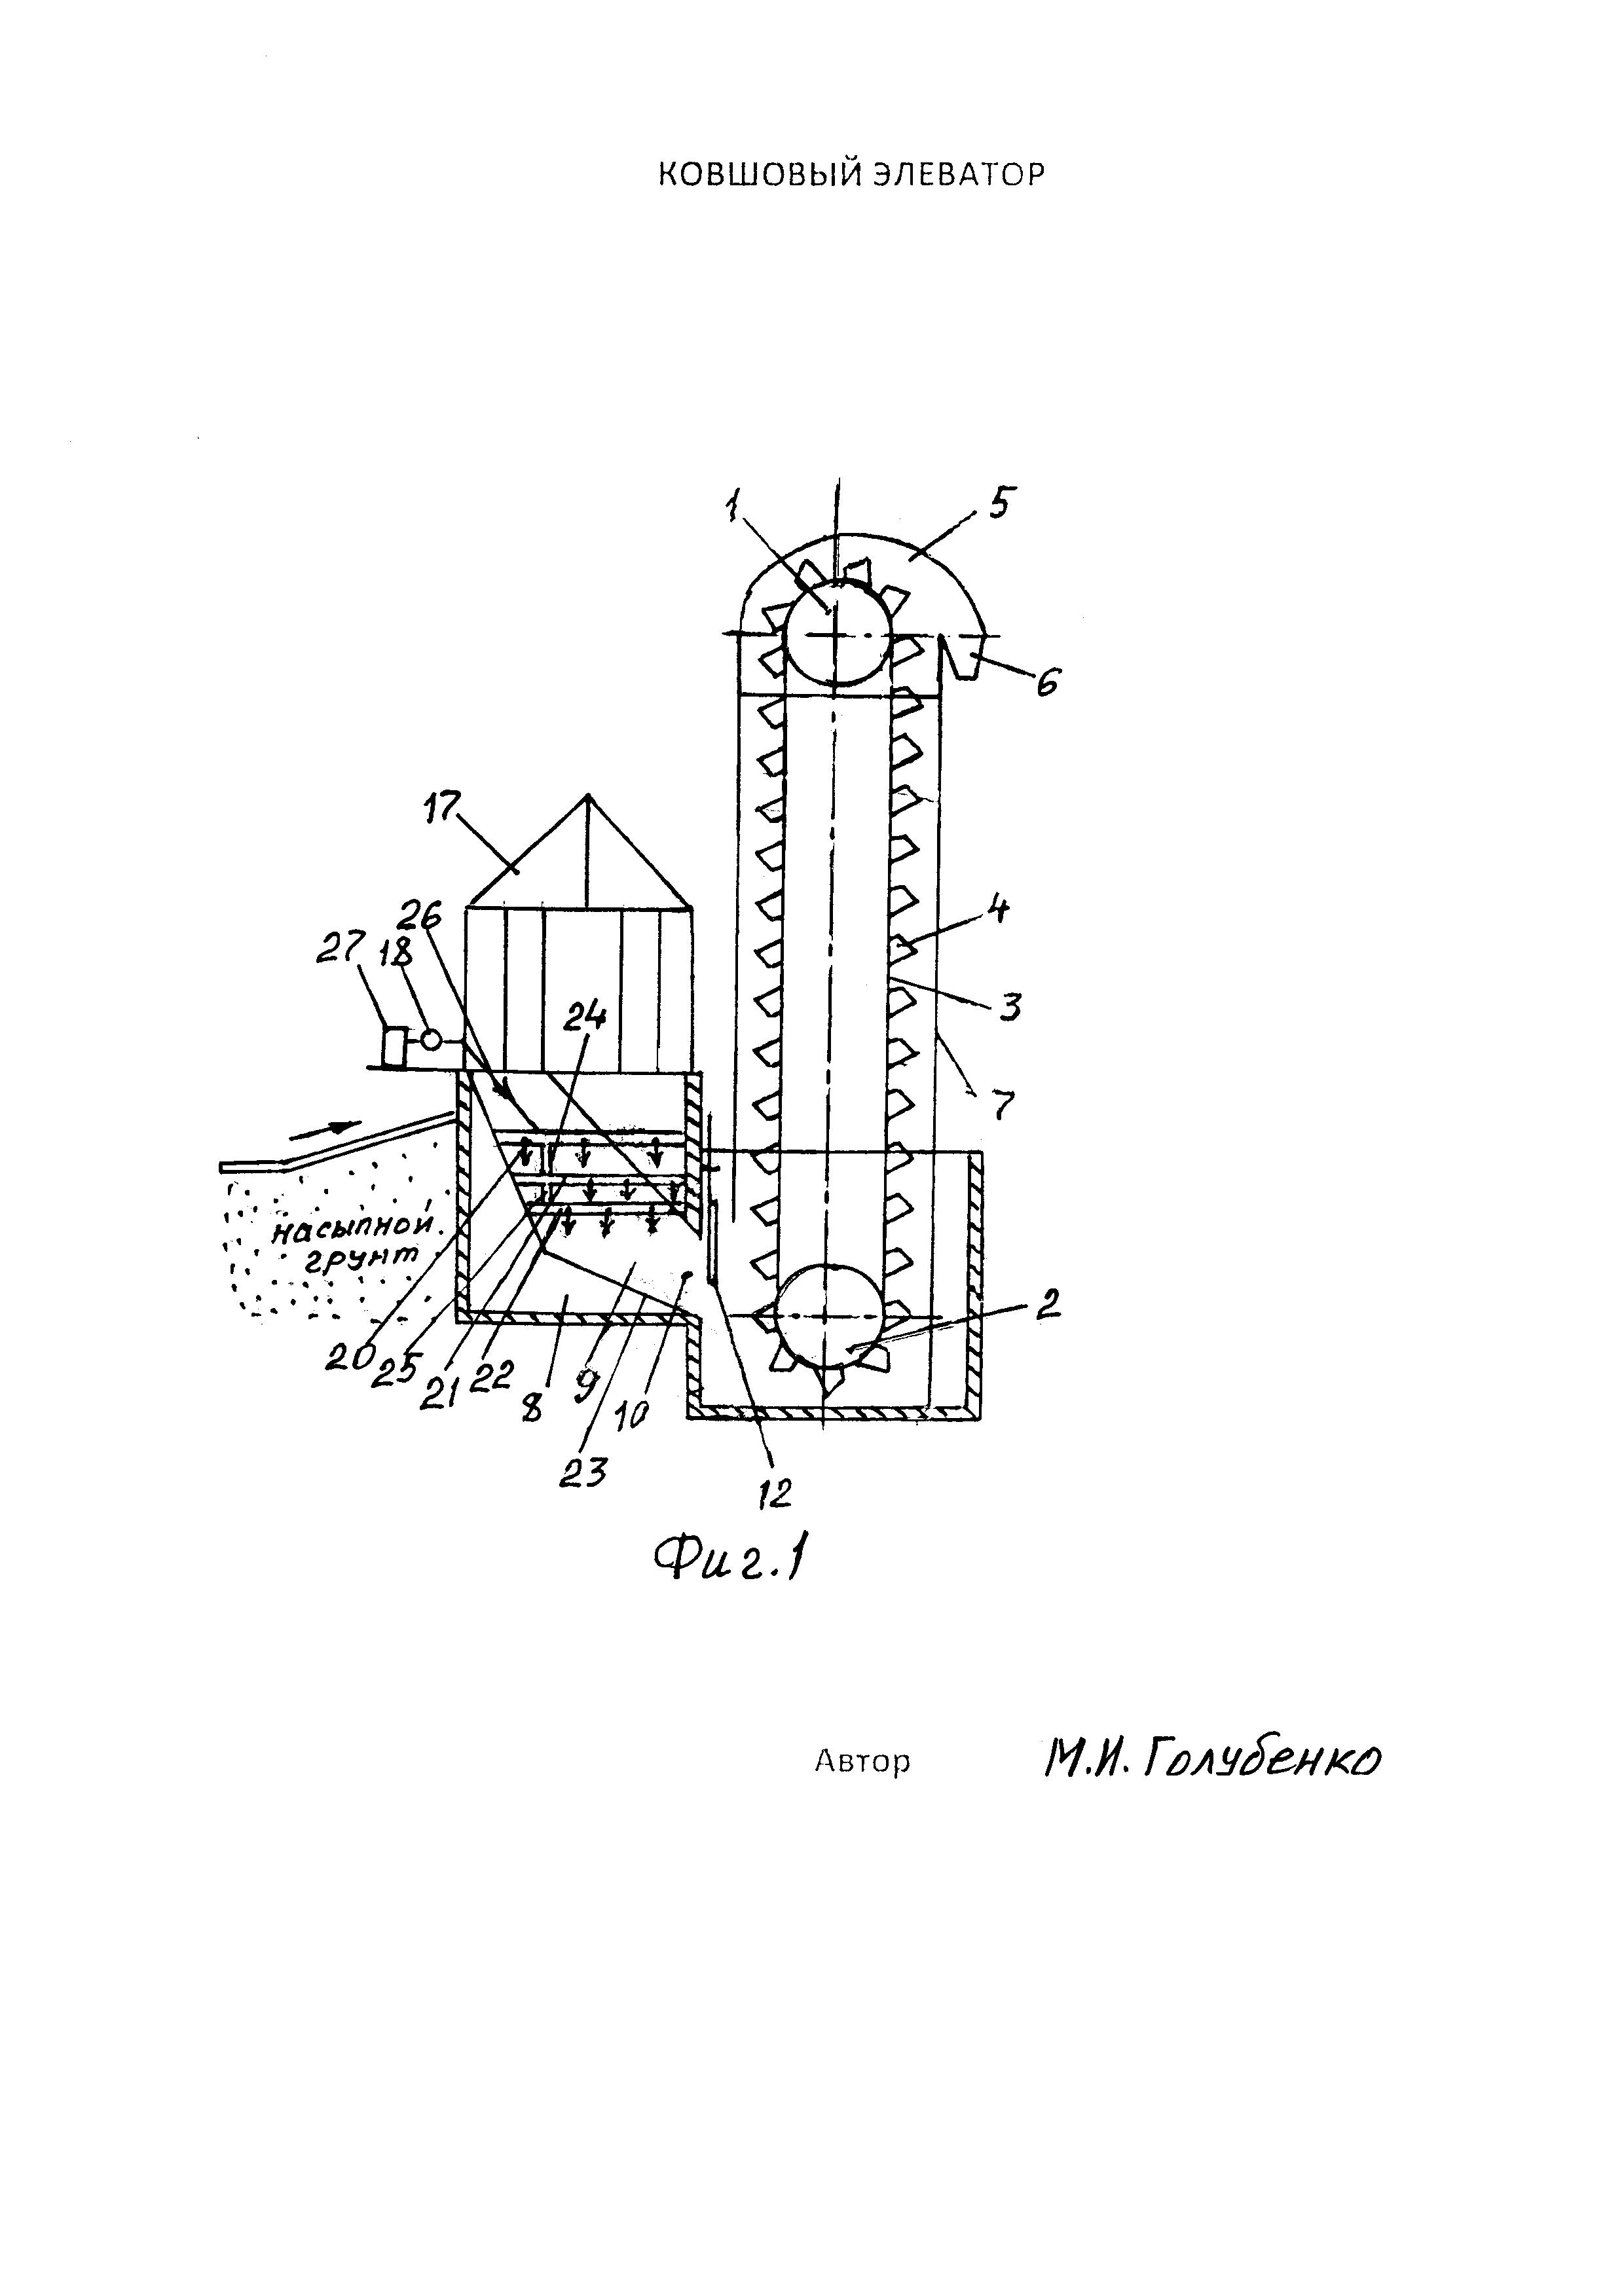 Изобретение элеватора технологические нагрузки от конвейера